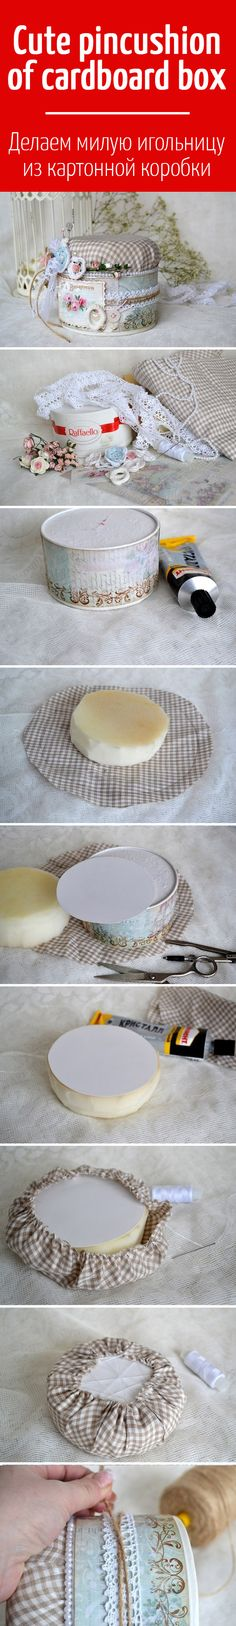 How to make cute pincushion of cardboard box / Делаем милую игольницу из картонной коробки от конфет